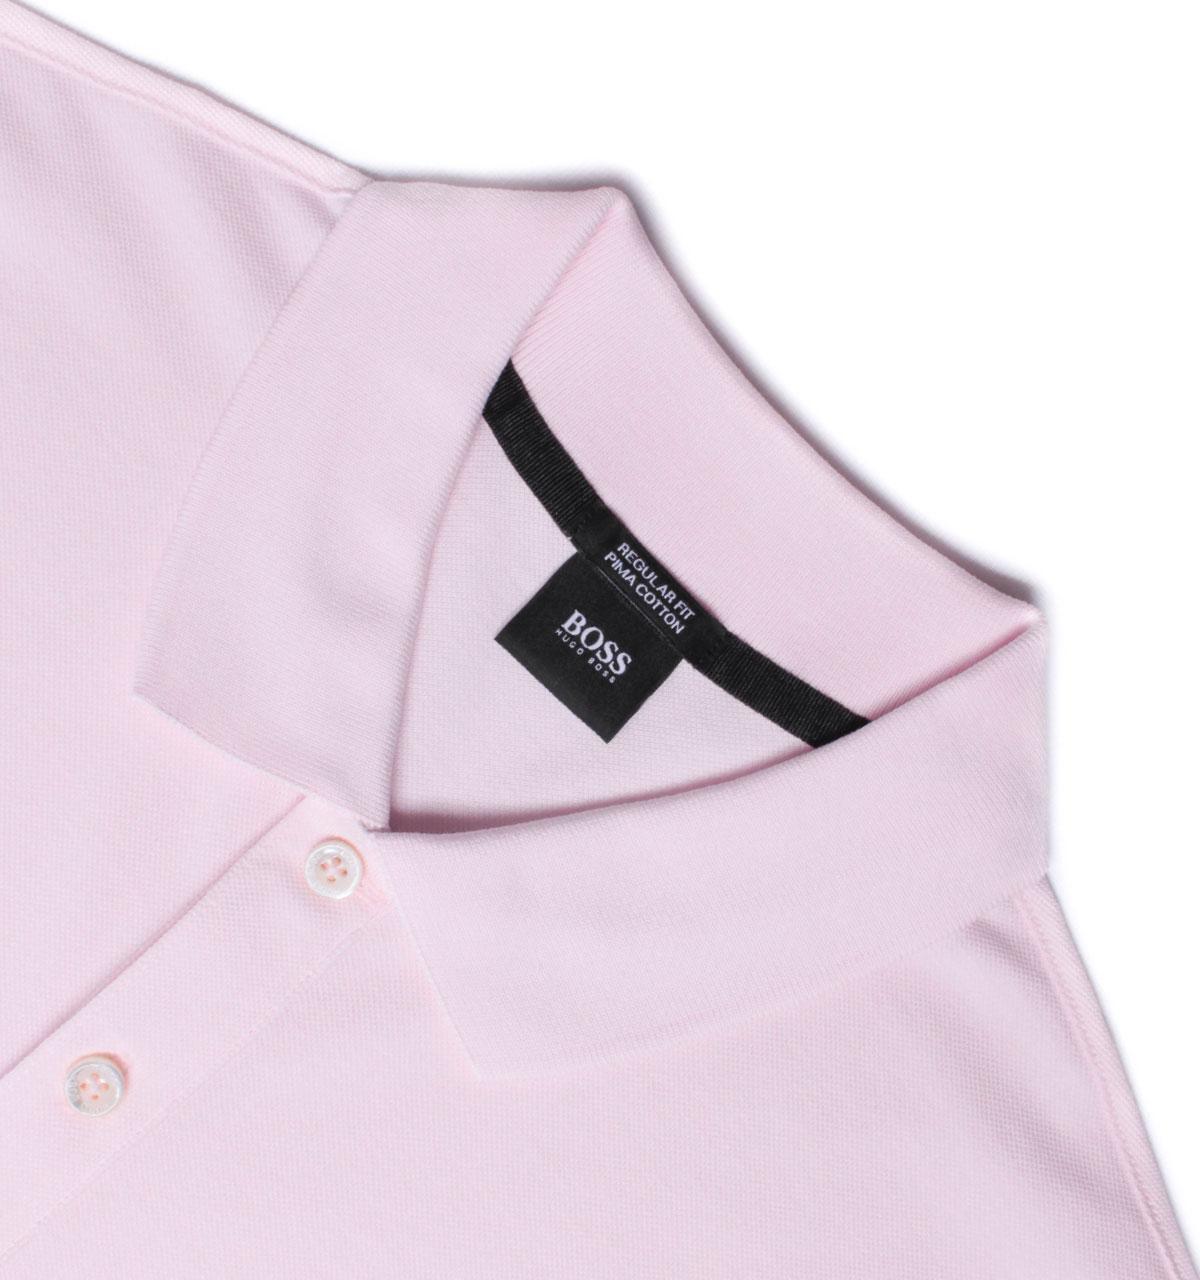 ecd2ec45 BOSS Pallas Pale Pink Pima Cotton Pique Polo Shirt in Pink for Men ...